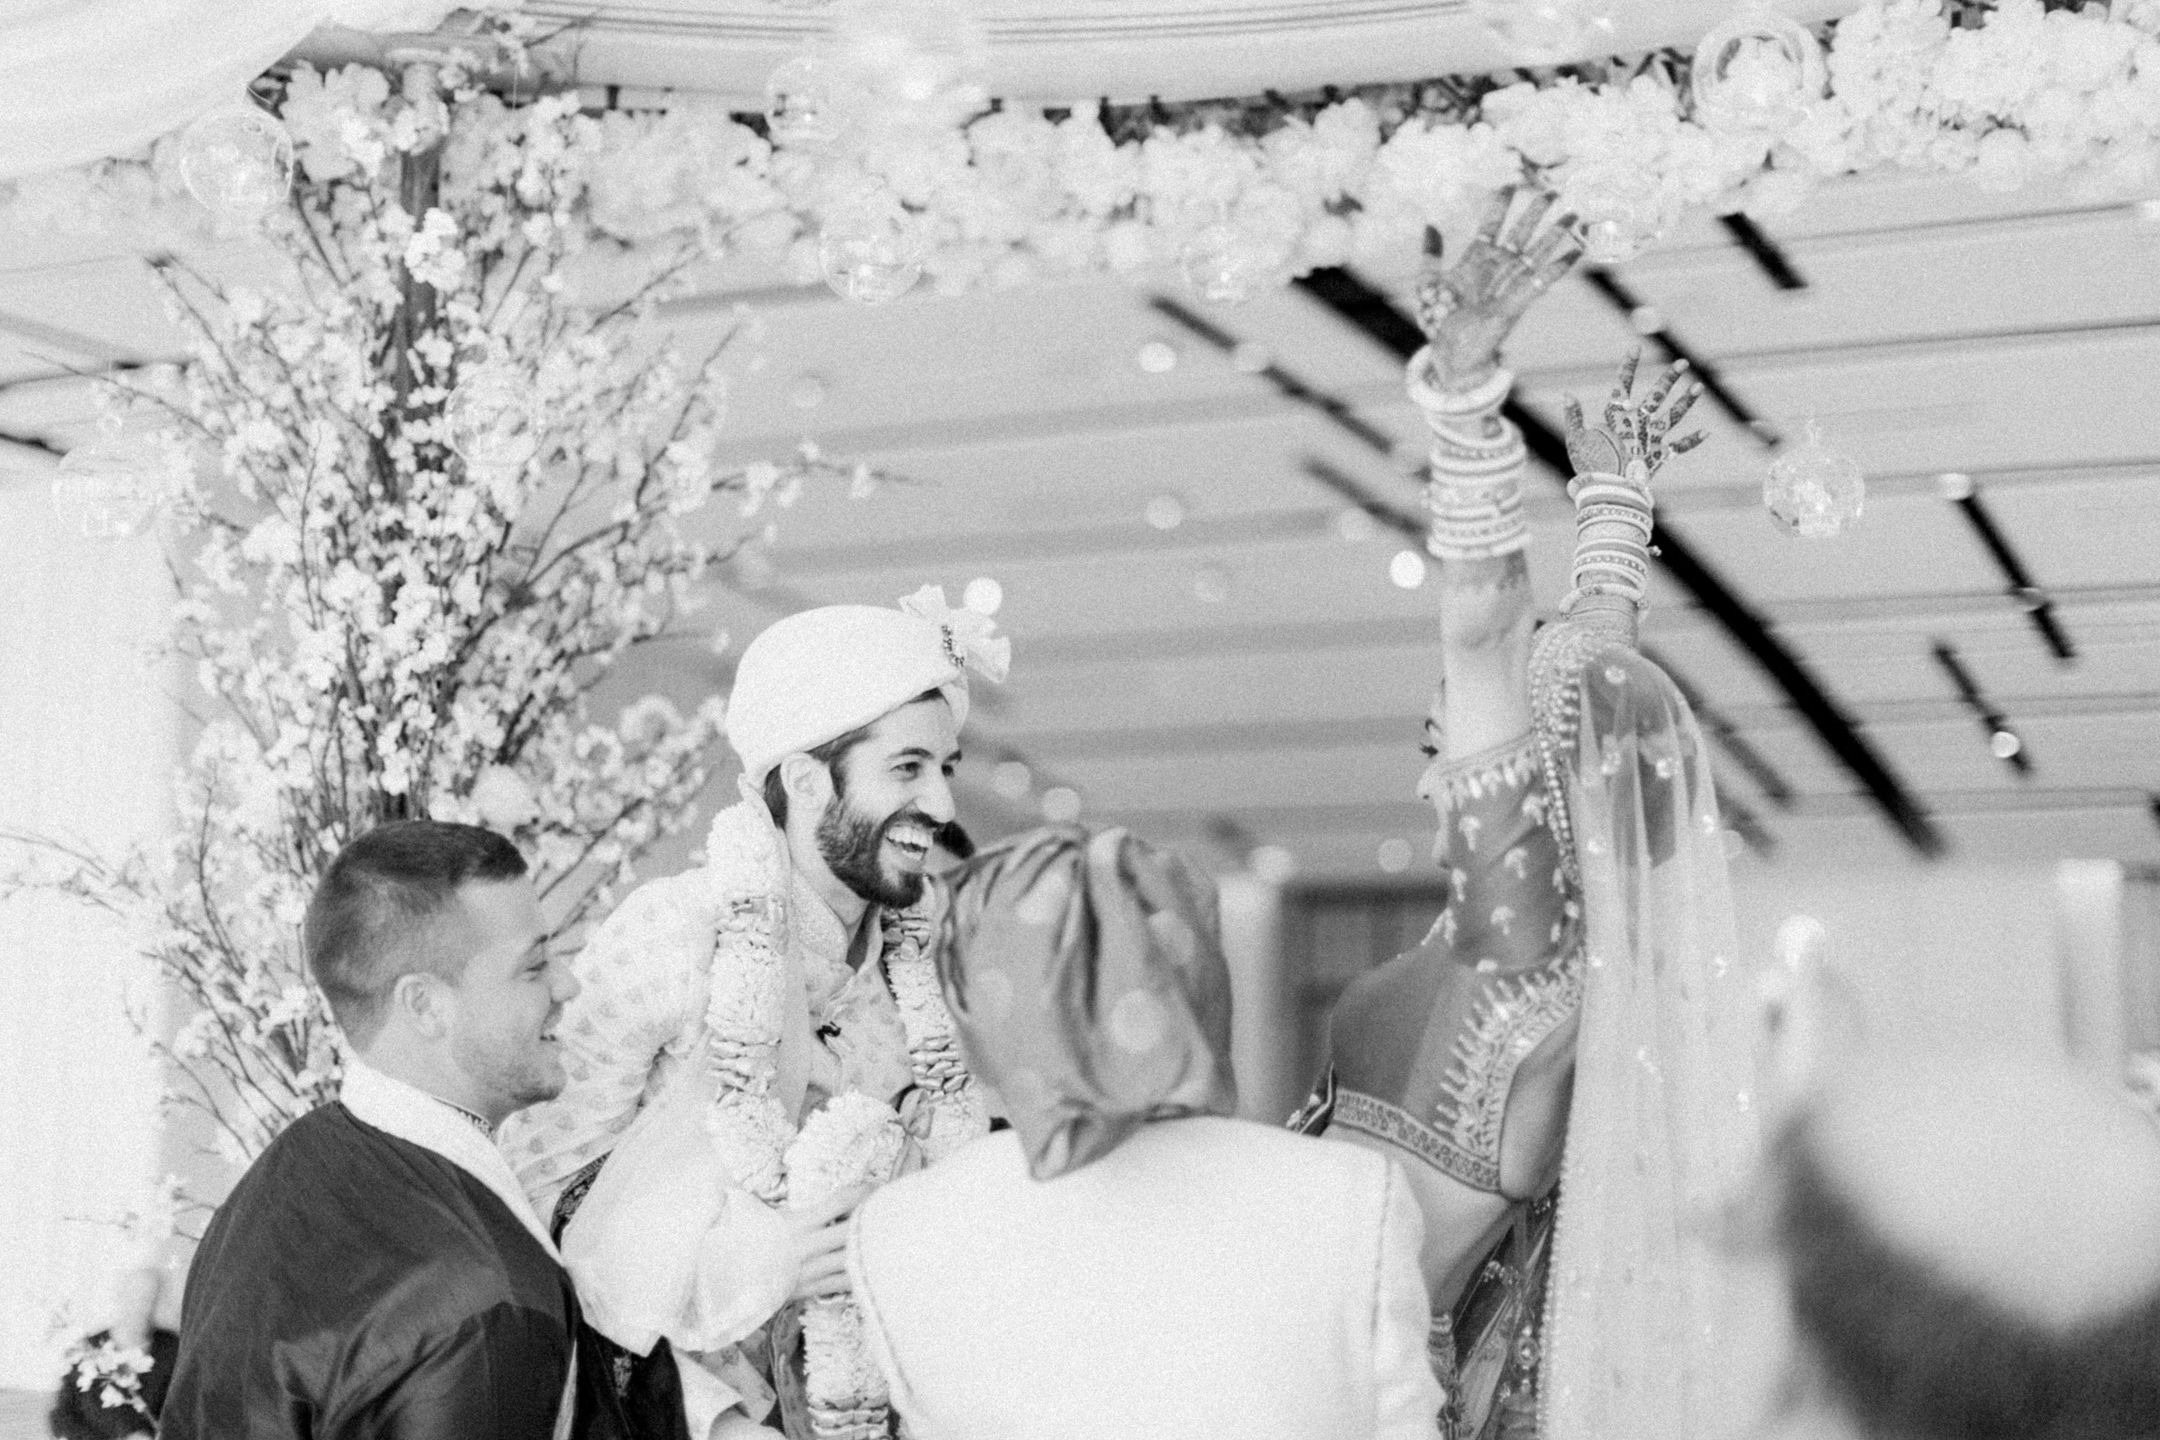 PRIYATA + JESSE'S WEDDING TEASERS